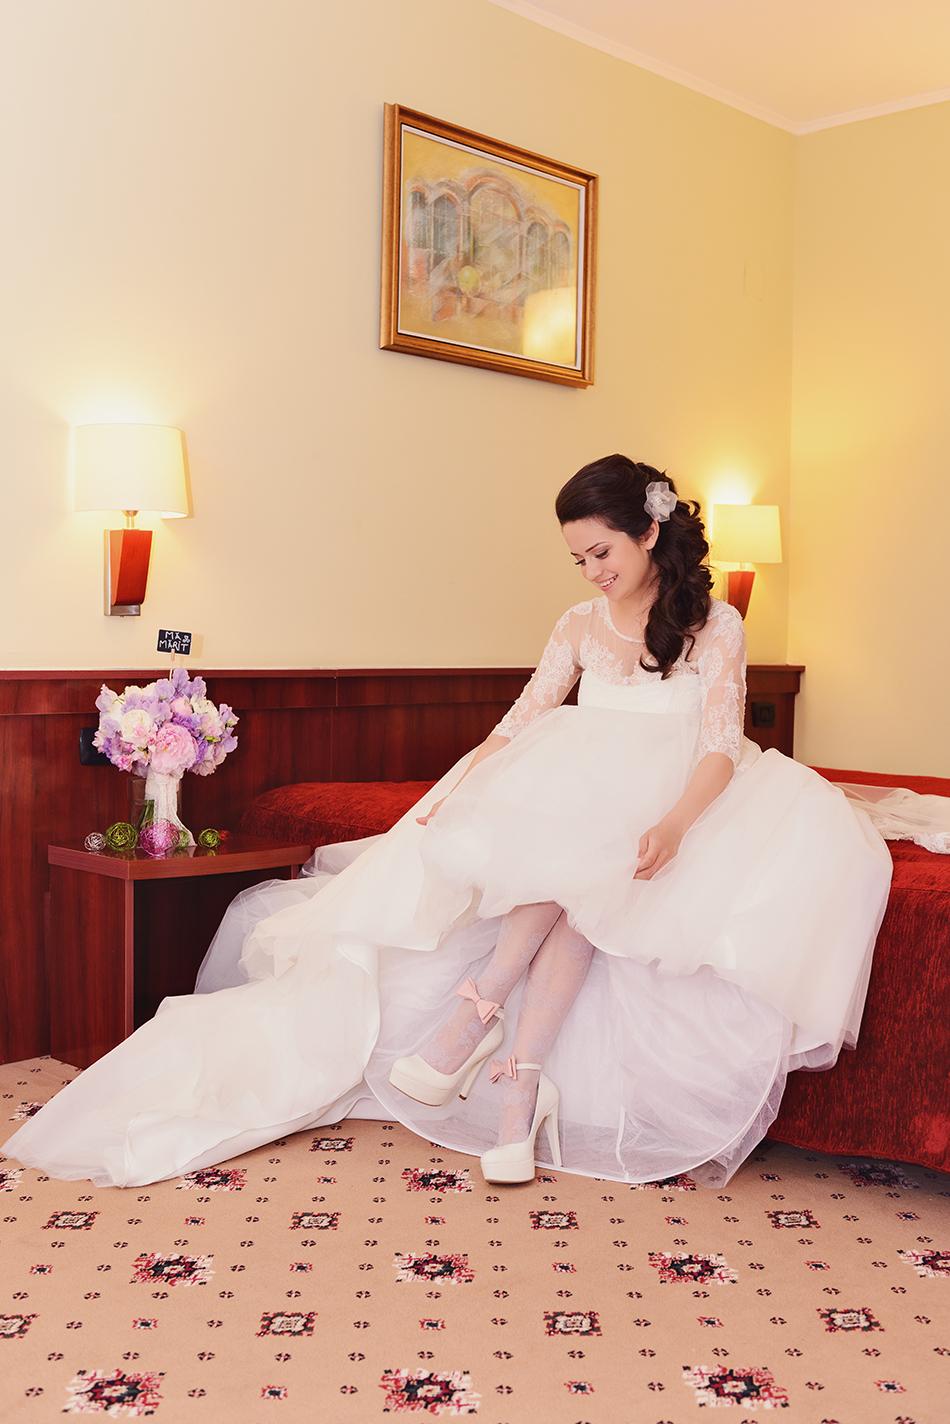 AD Passion Photography | fotograf-nunta-bucuresti_lorena-si-ammadeuss_0020 | Adelin, Dida, fotograf profesionist, fotograf de nunta, fotografie de nunta, fotograf Timisoara, fotograf Craiova, fotograf Bucuresti, fotograf Arad, nunta Timisoara, nunta Arad, nunta Bucuresti, nunta Craiova